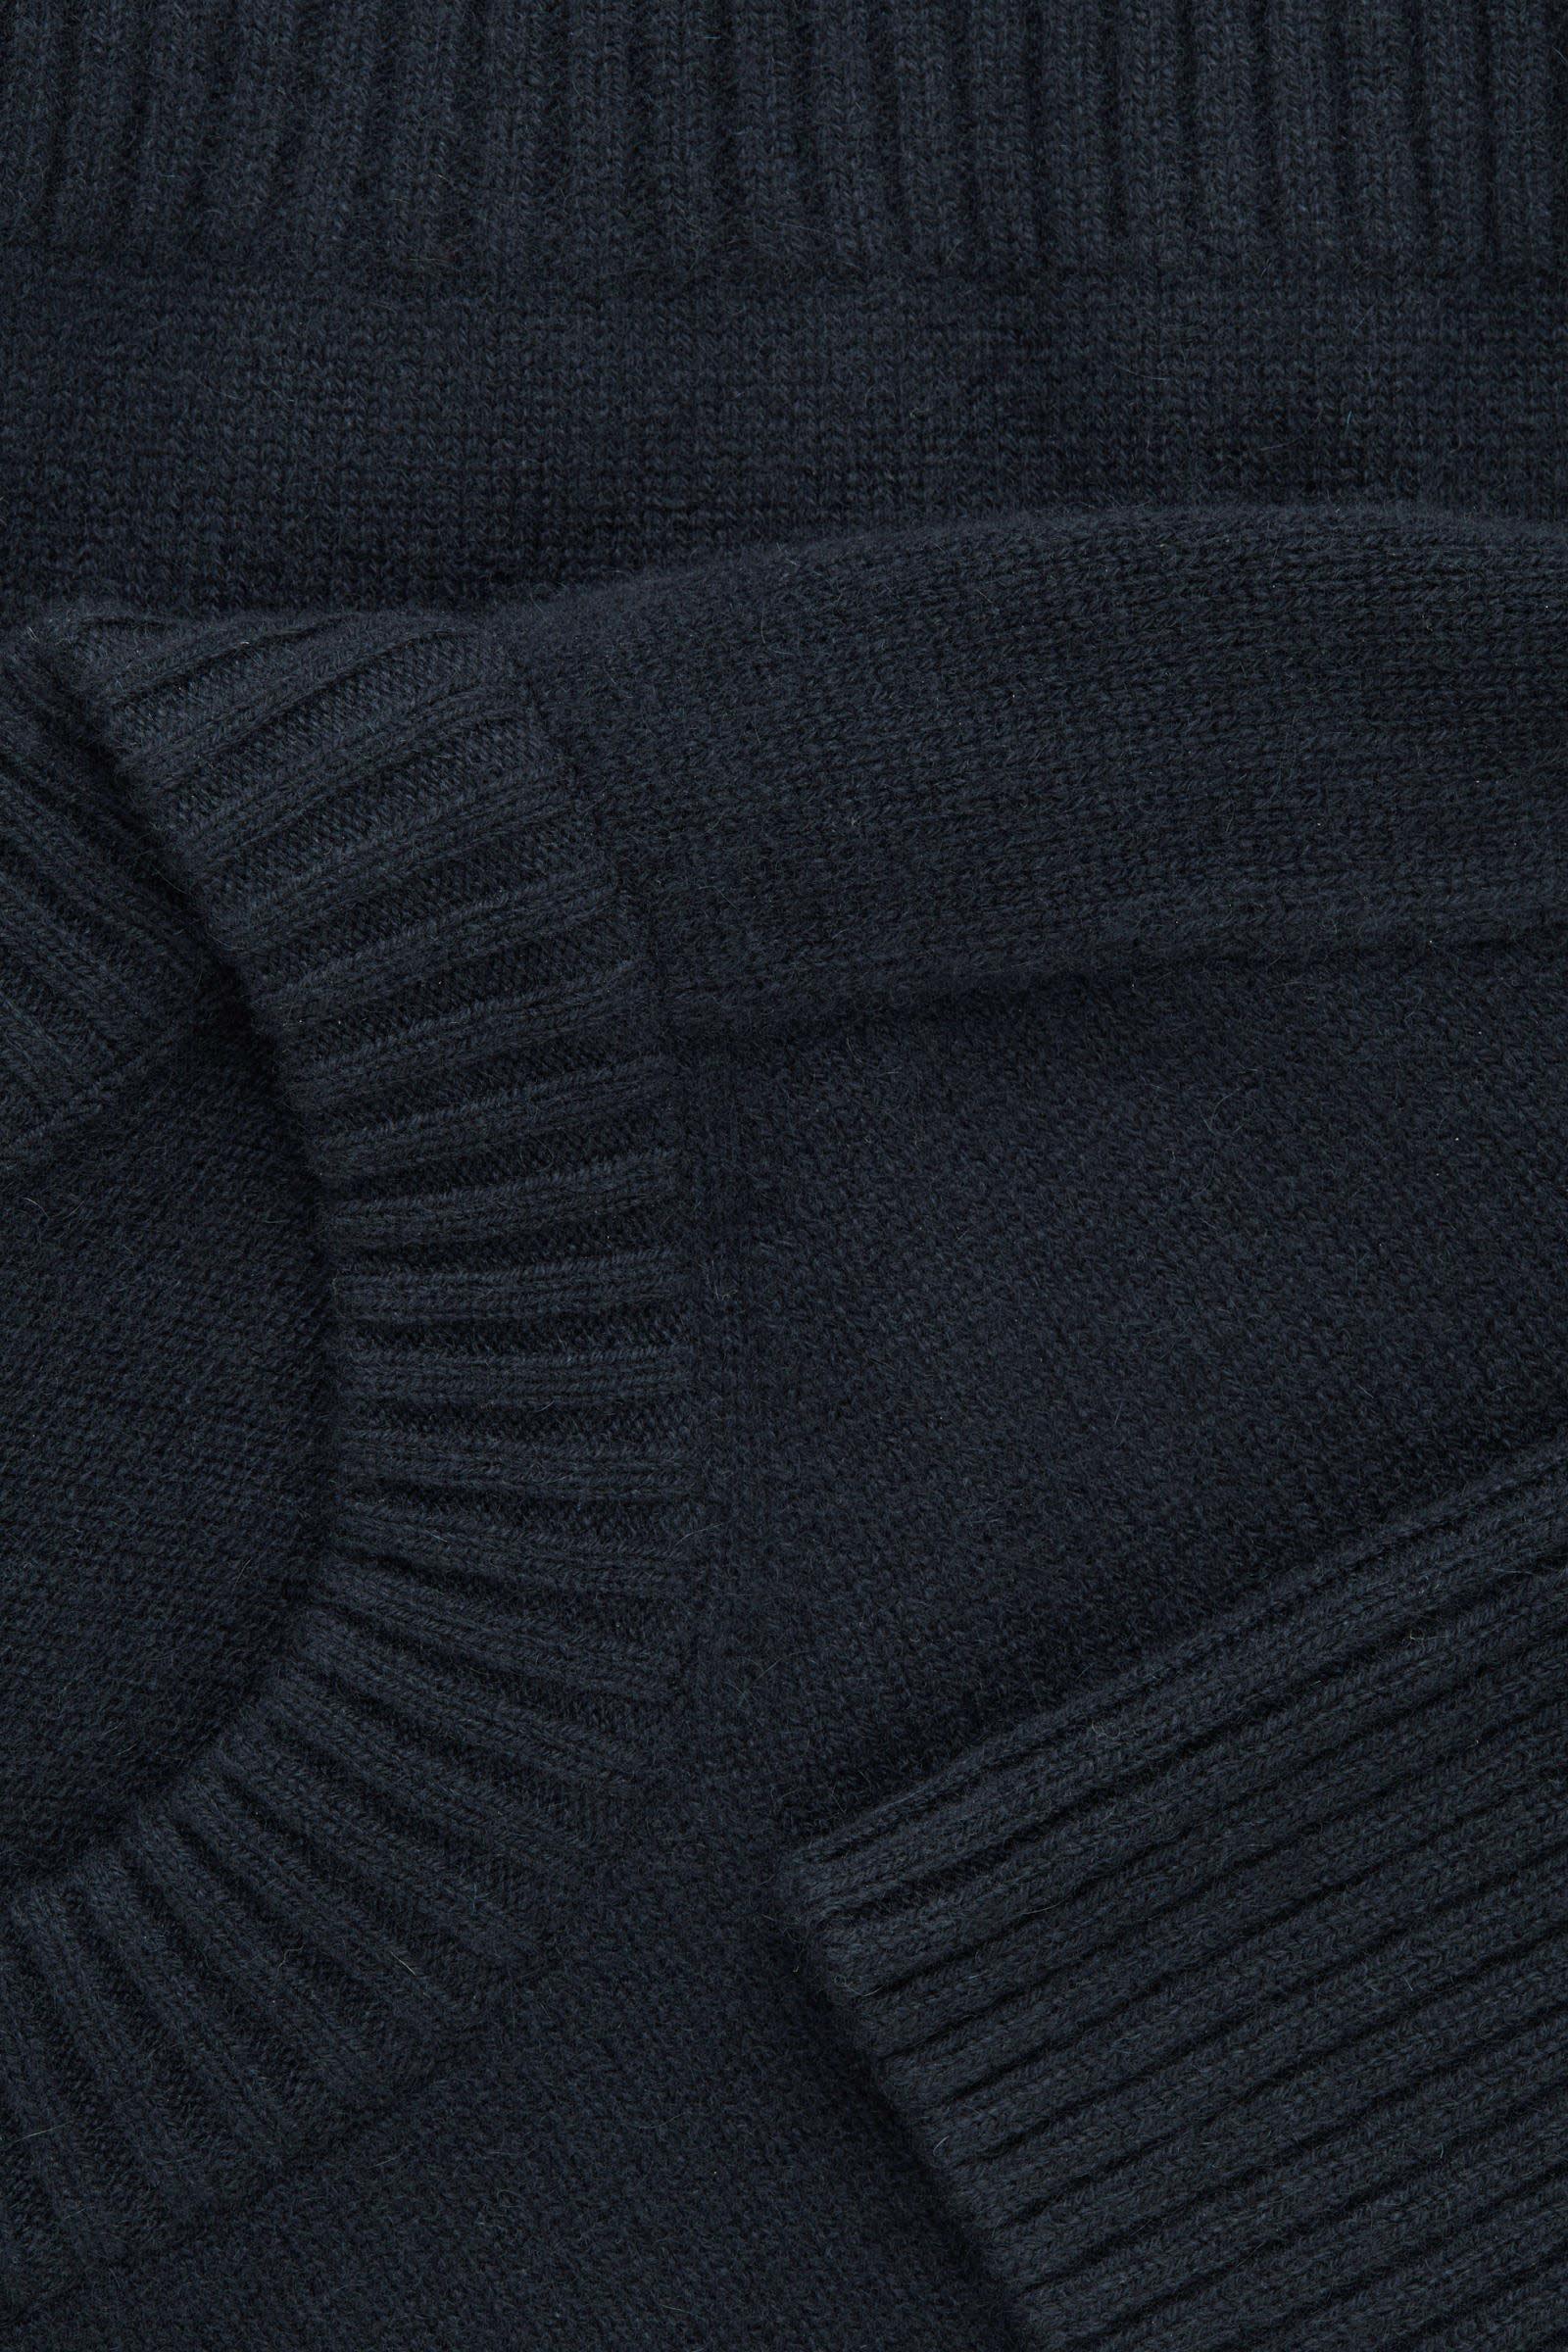 COS 리브 디테일 캐시미어 스웨터의 네이비컬러 Detail입니다.